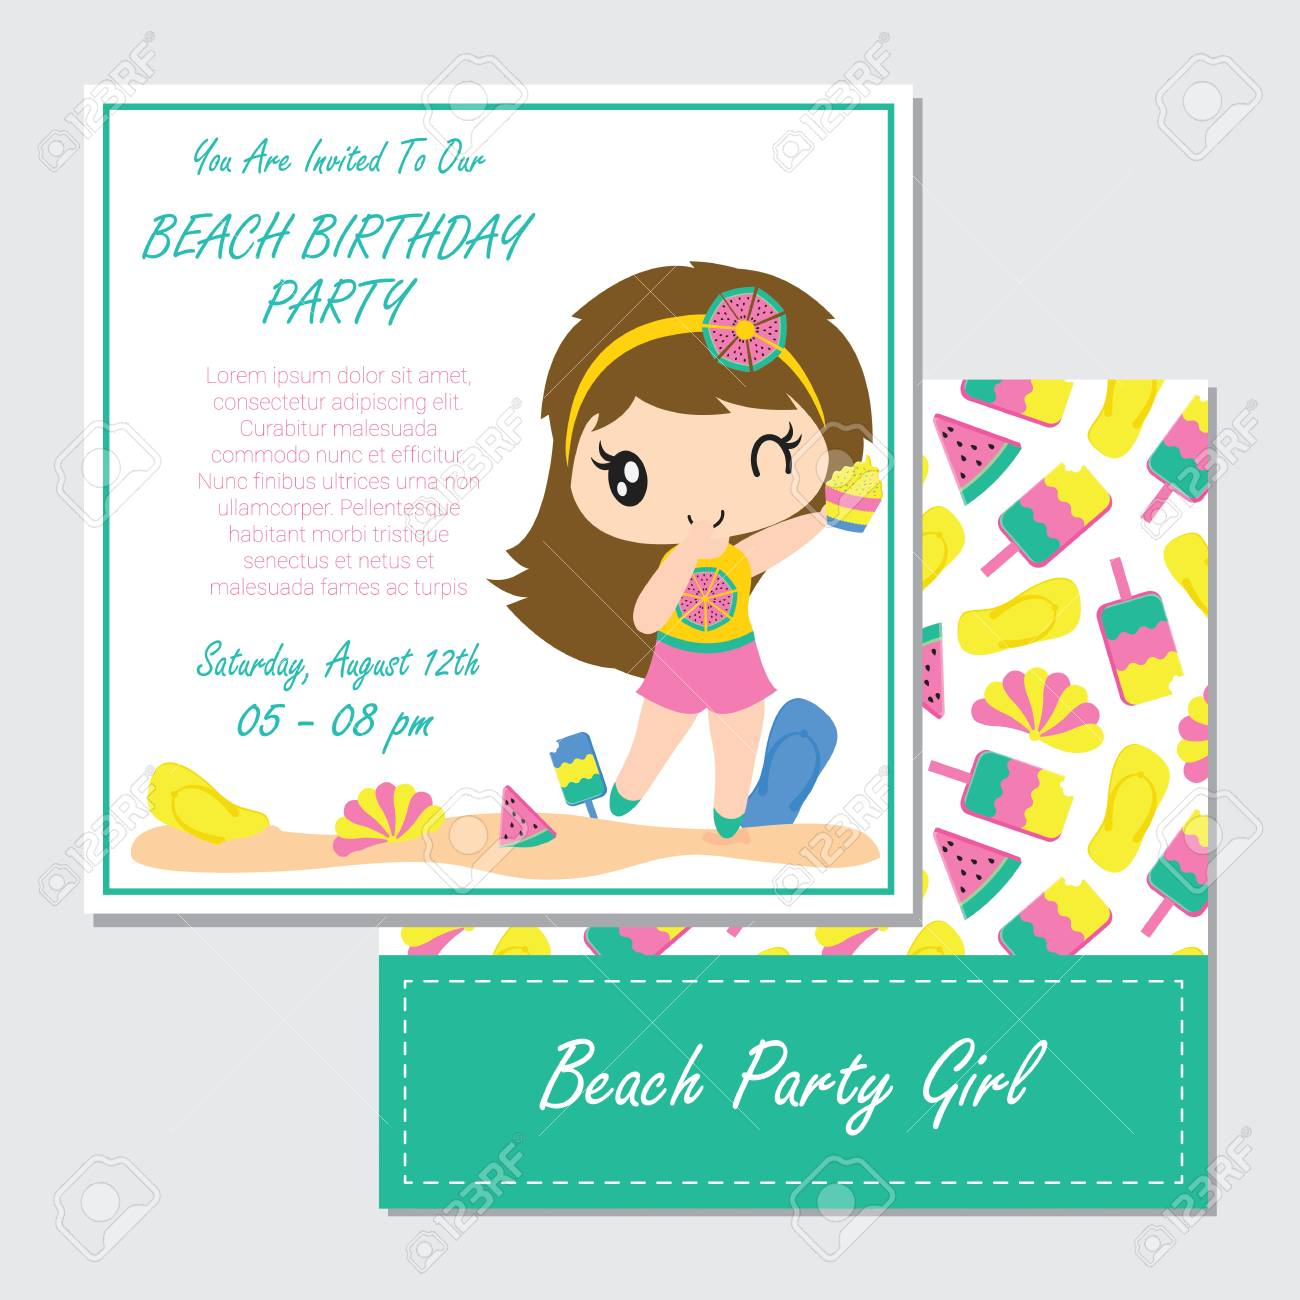 Cute Girl Plays On The Beach For Birthday Card Design Template